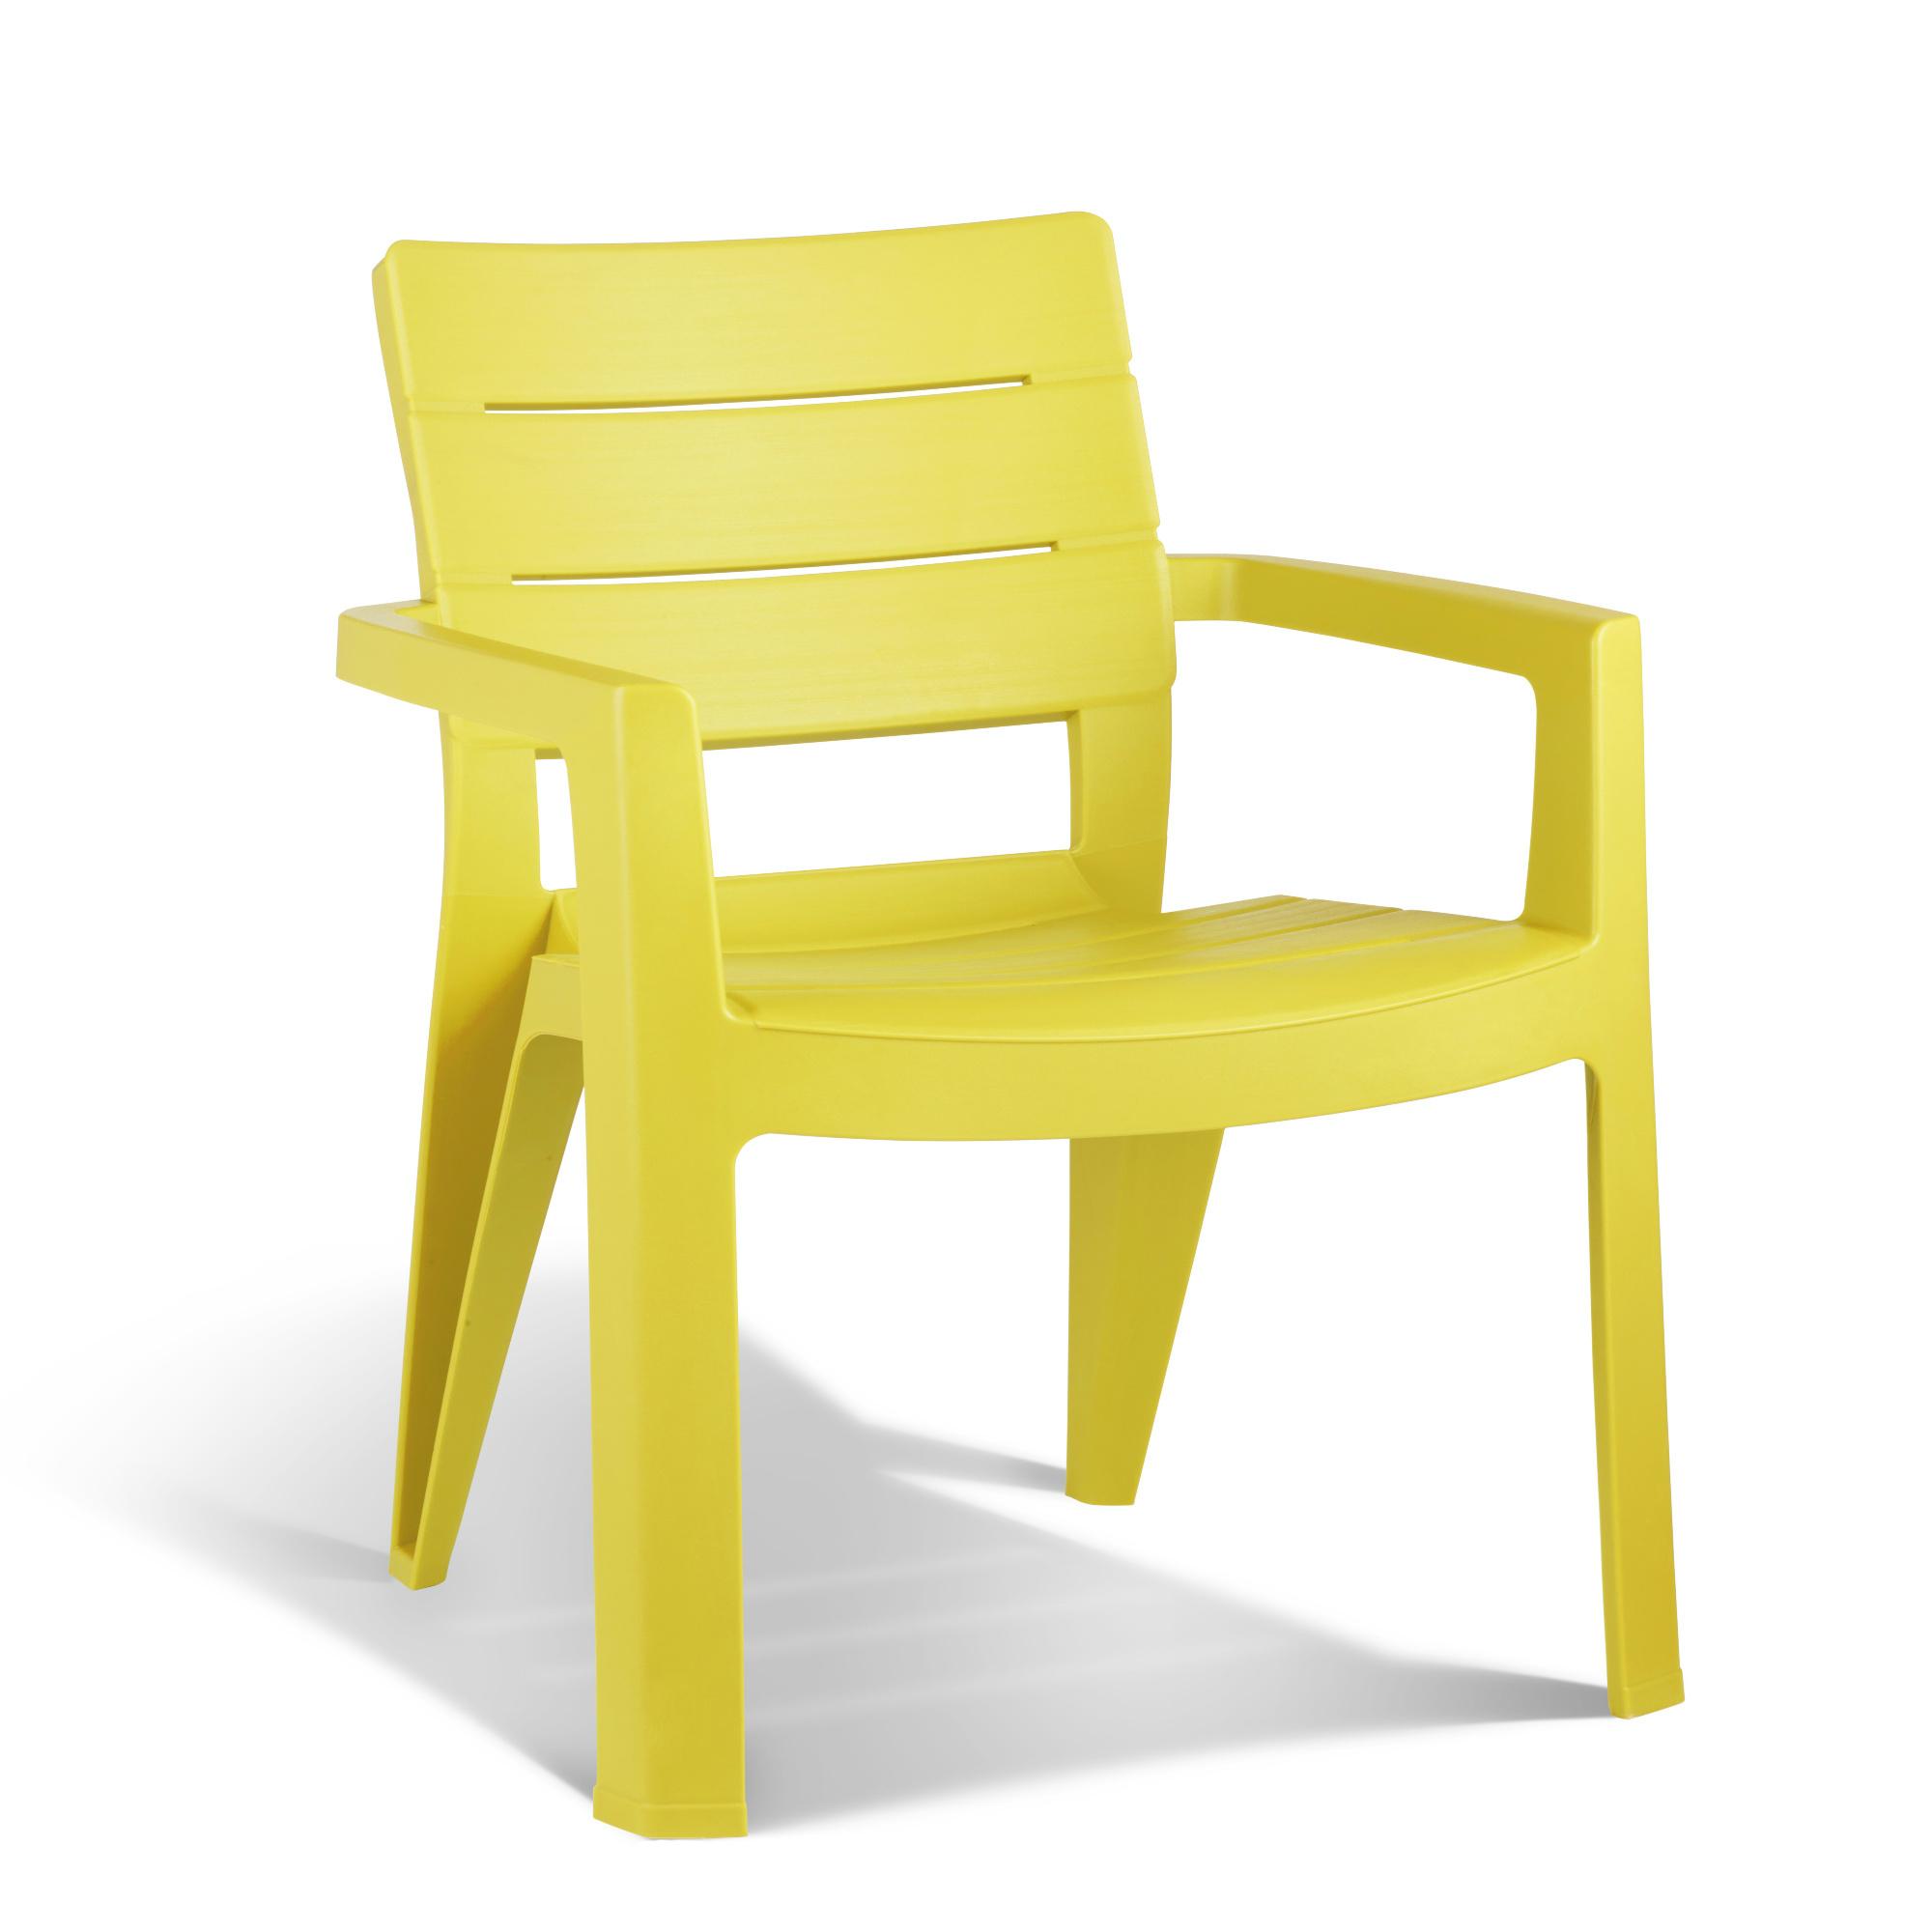 chaise ibiza allibert jaune chaises fauteuils de jardin meubles de jardin jardin. Black Bedroom Furniture Sets. Home Design Ideas